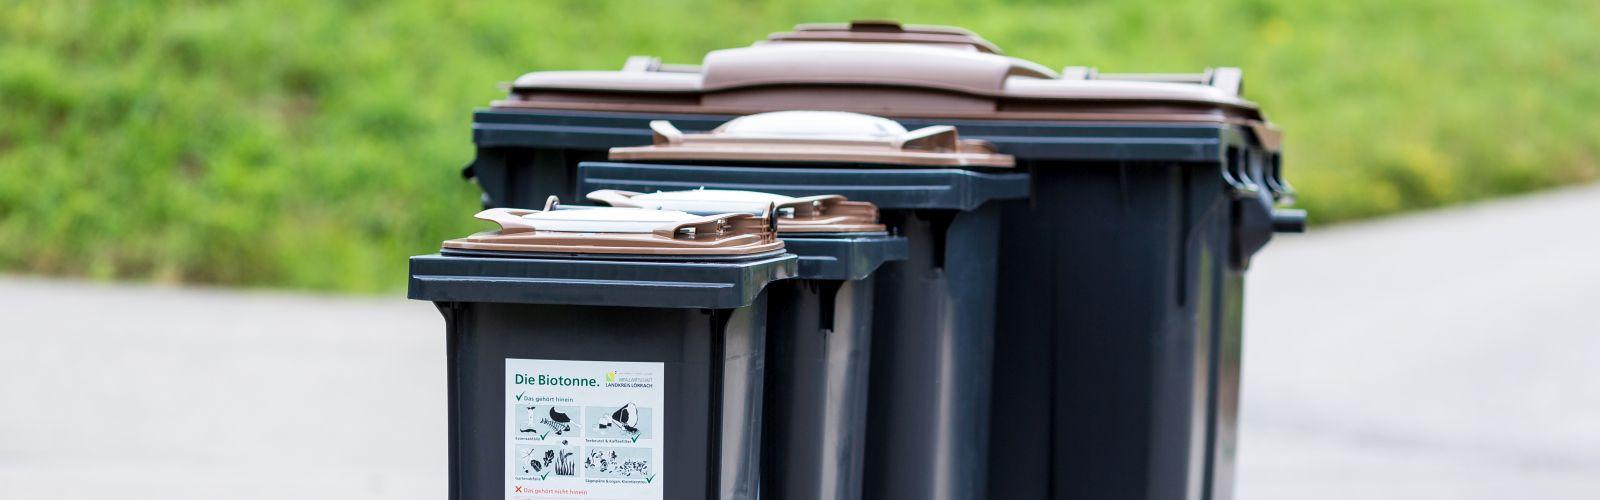 recyclinghof märkt öffnungszeiten